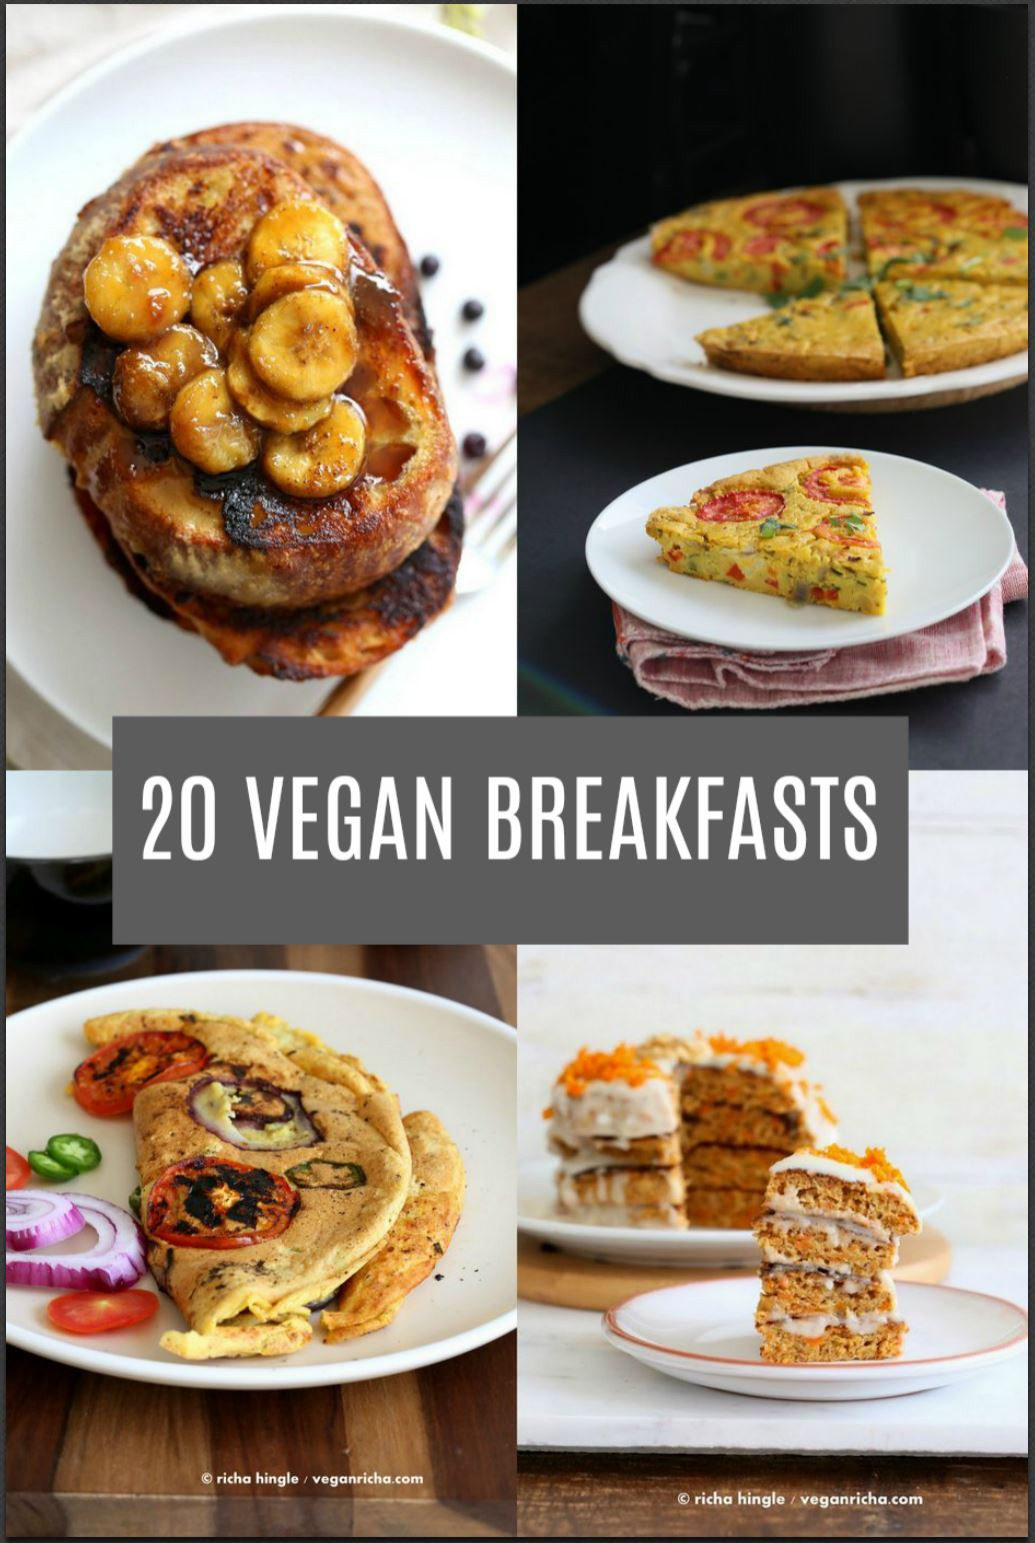 Best Vegan Breakfast Recipes  20 Vegan Breakfast Recipes Vegan Richa